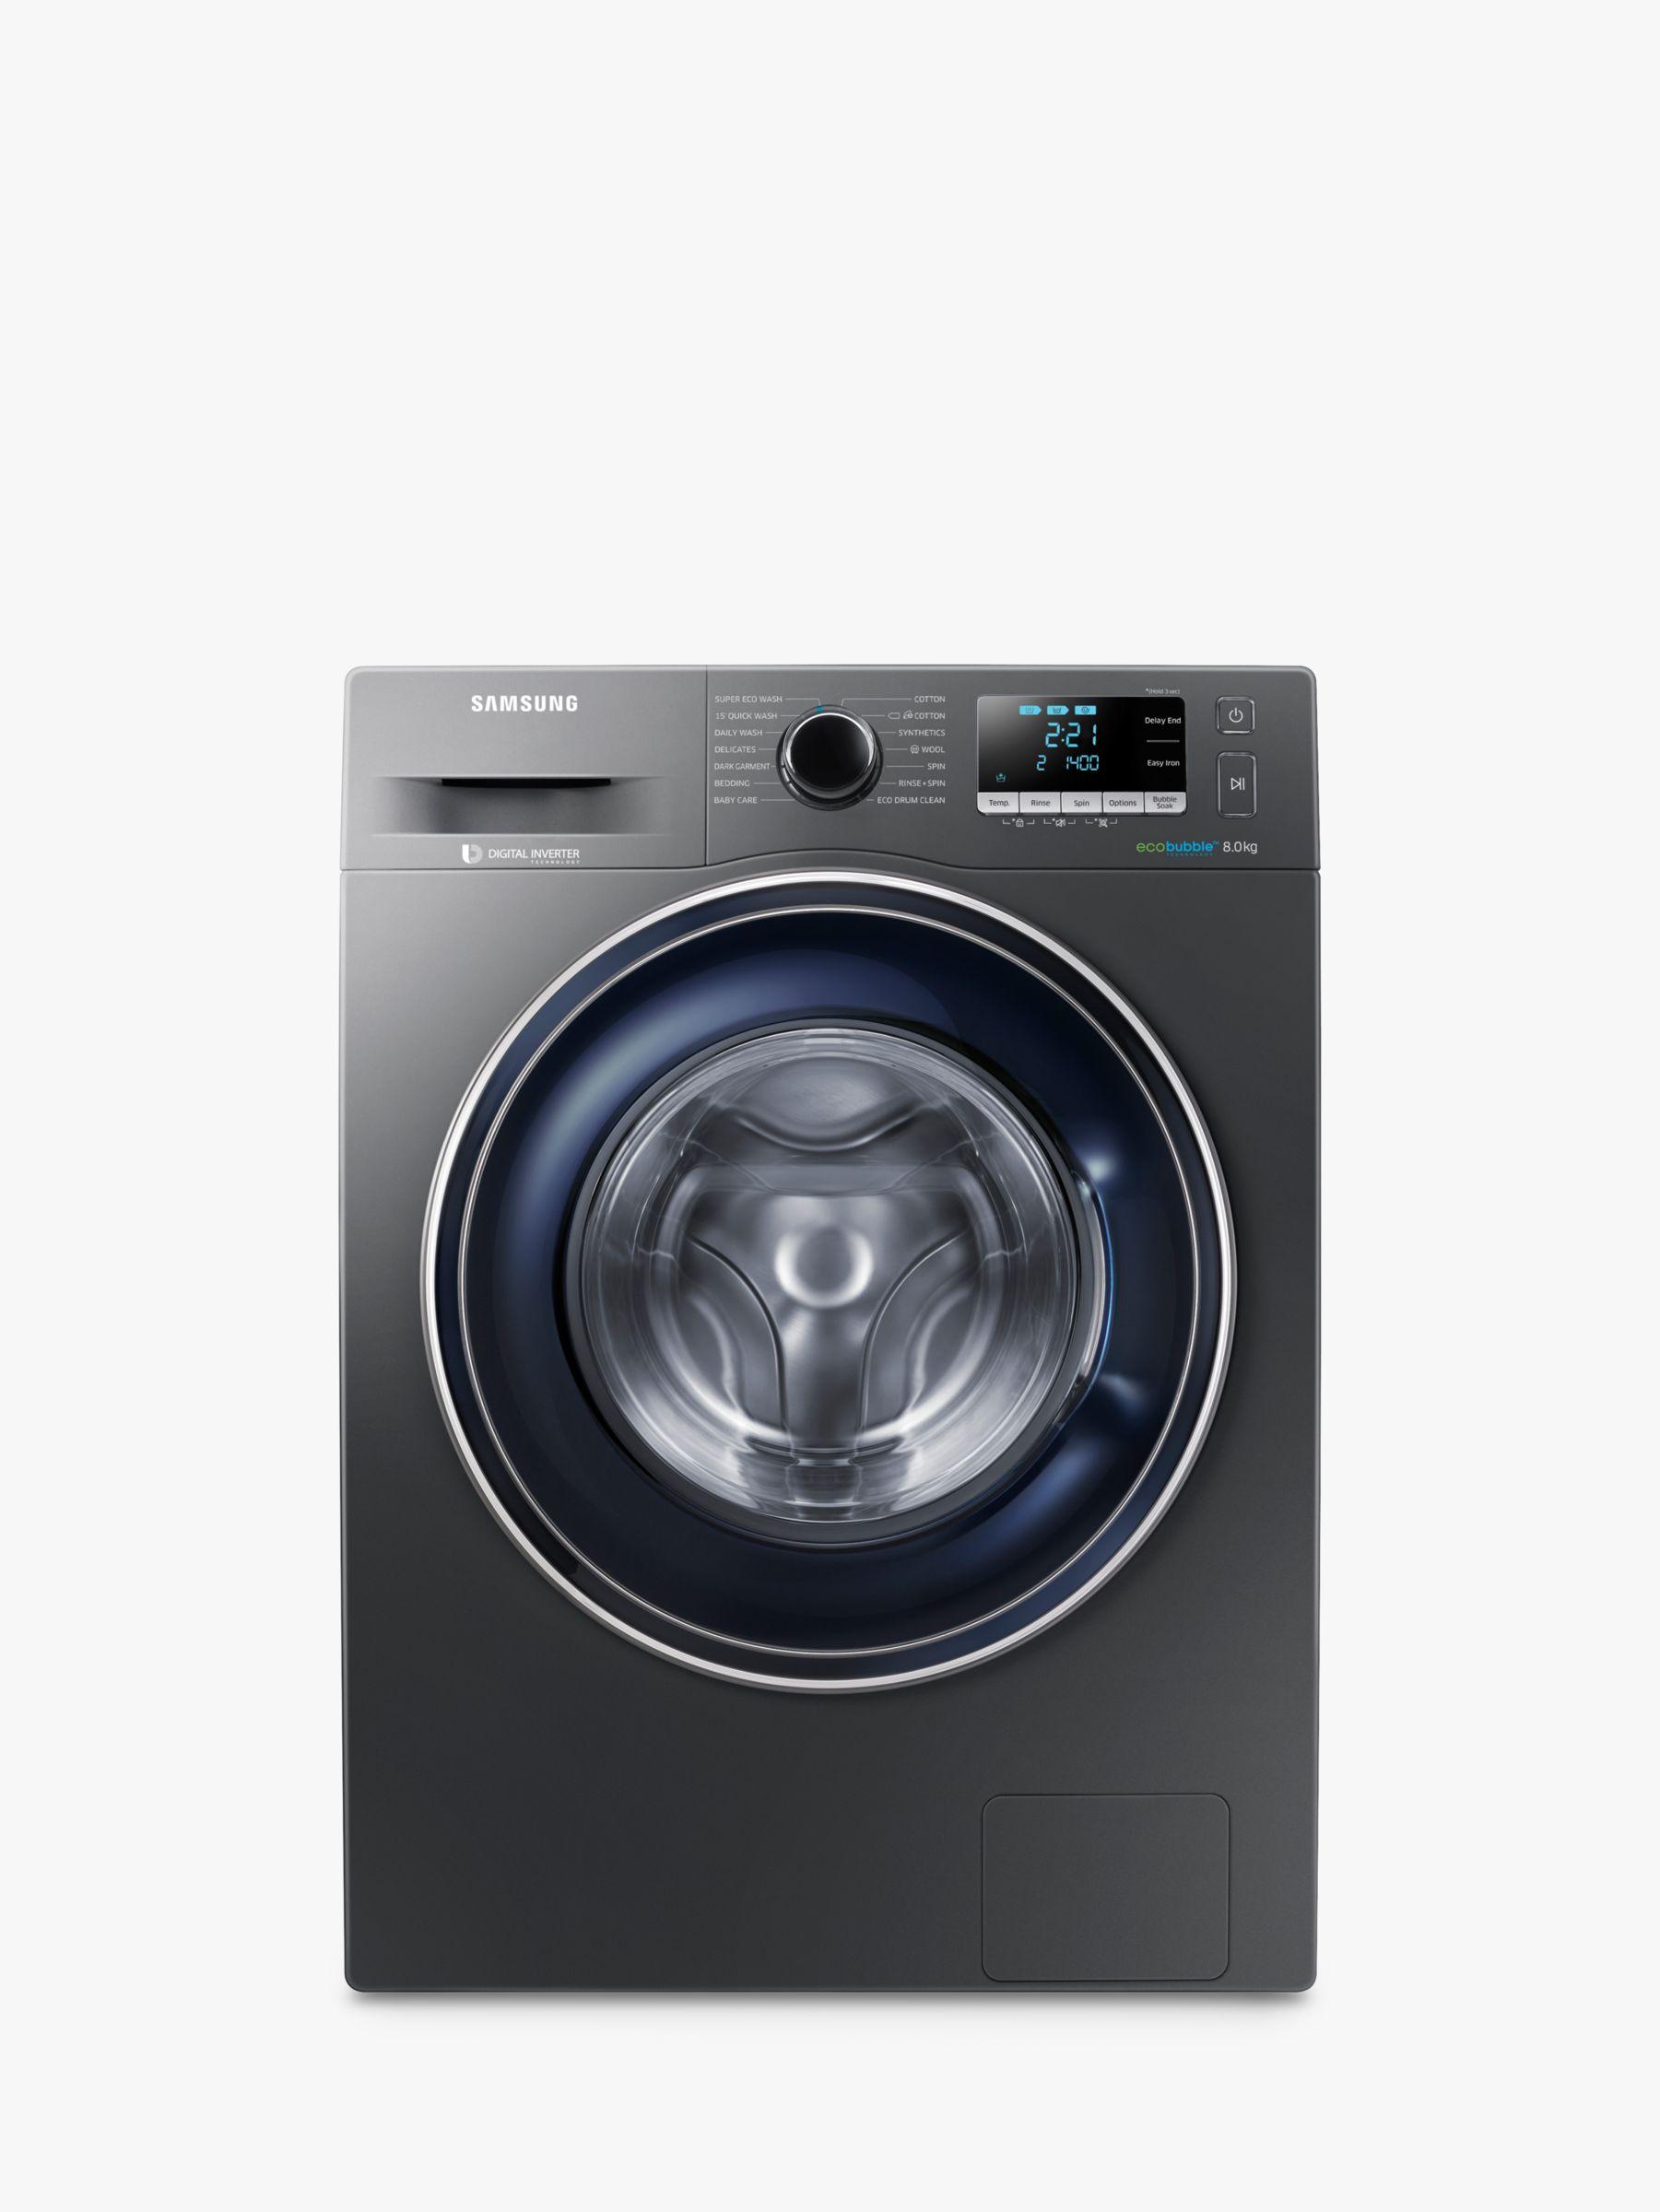 Samsung Samsung WW80J5456FX/EU ecobubble™ Freestanding Washing Machine, 8kg Load, A+++ Energy Rating, 1400rpm Spin, Graphite